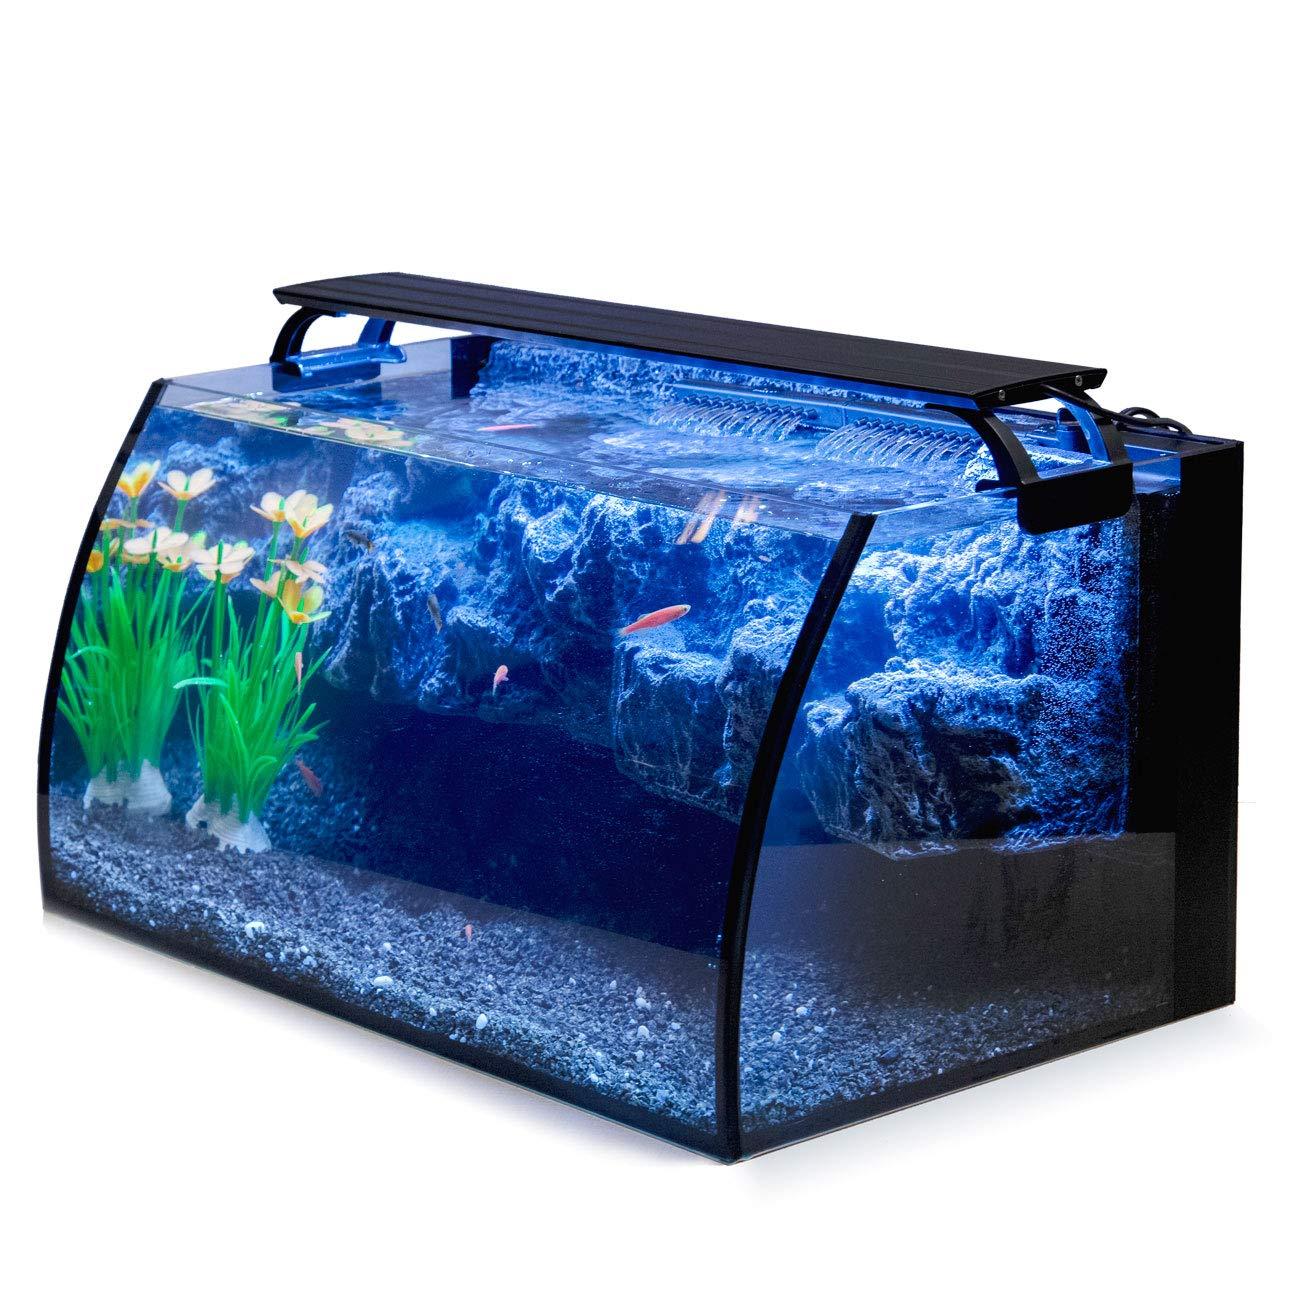 Hygger Horizon Glass Aquarium